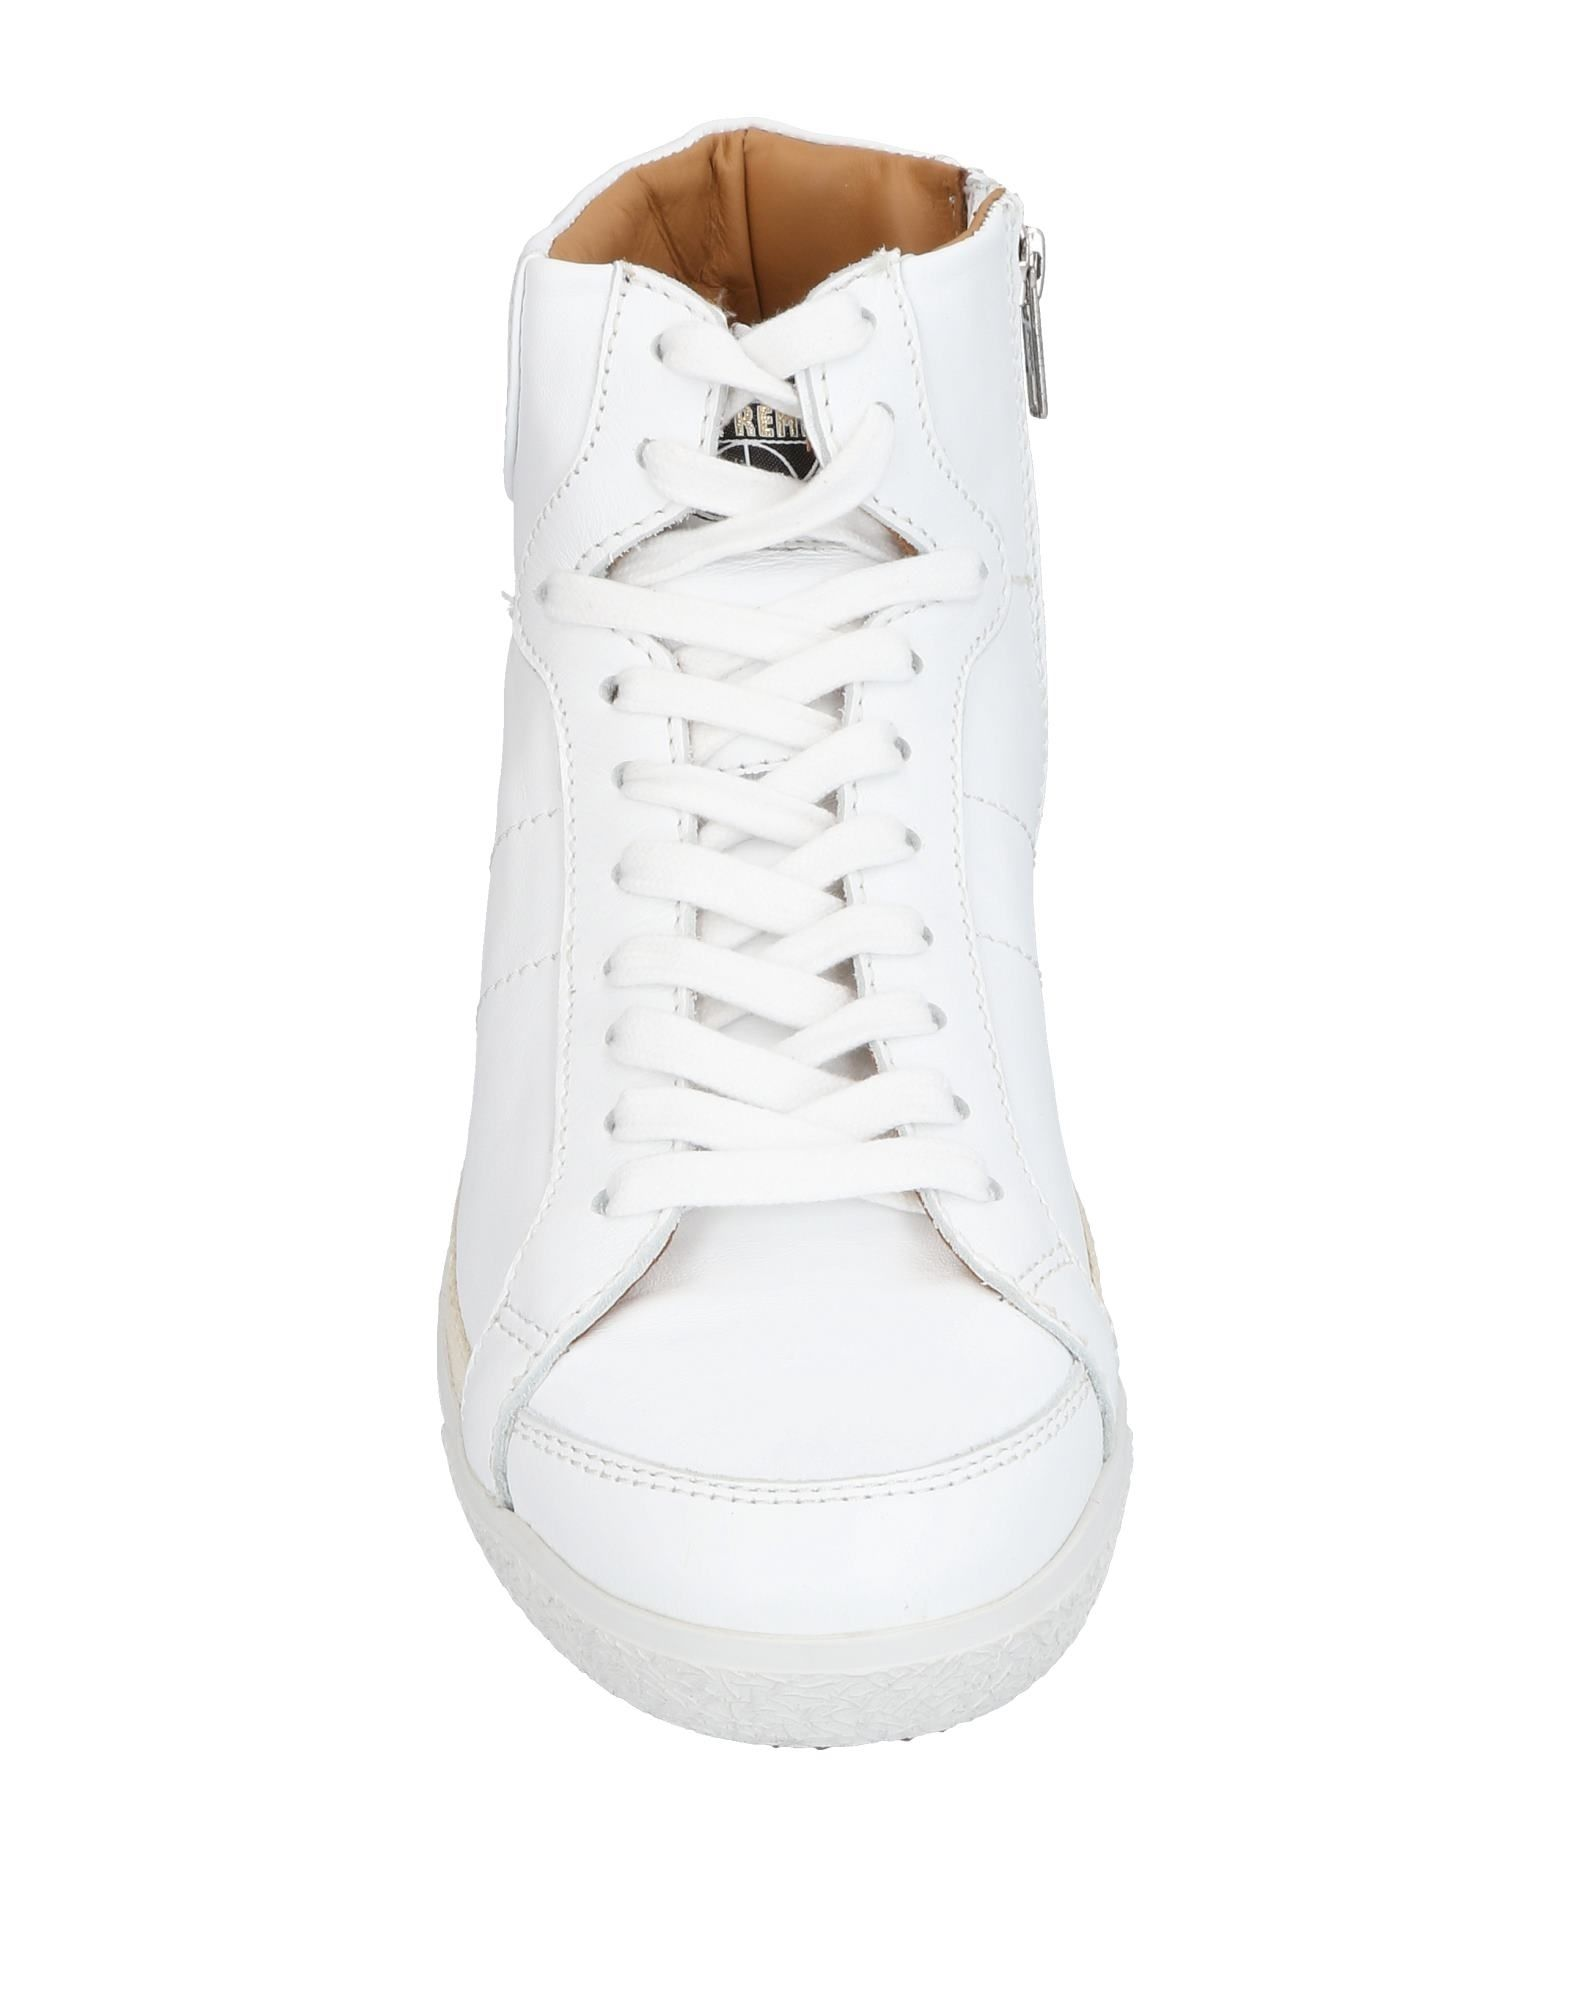 Pantofola D'oro Sneakers Herren  11456682TG 11456682TG  9f8bce